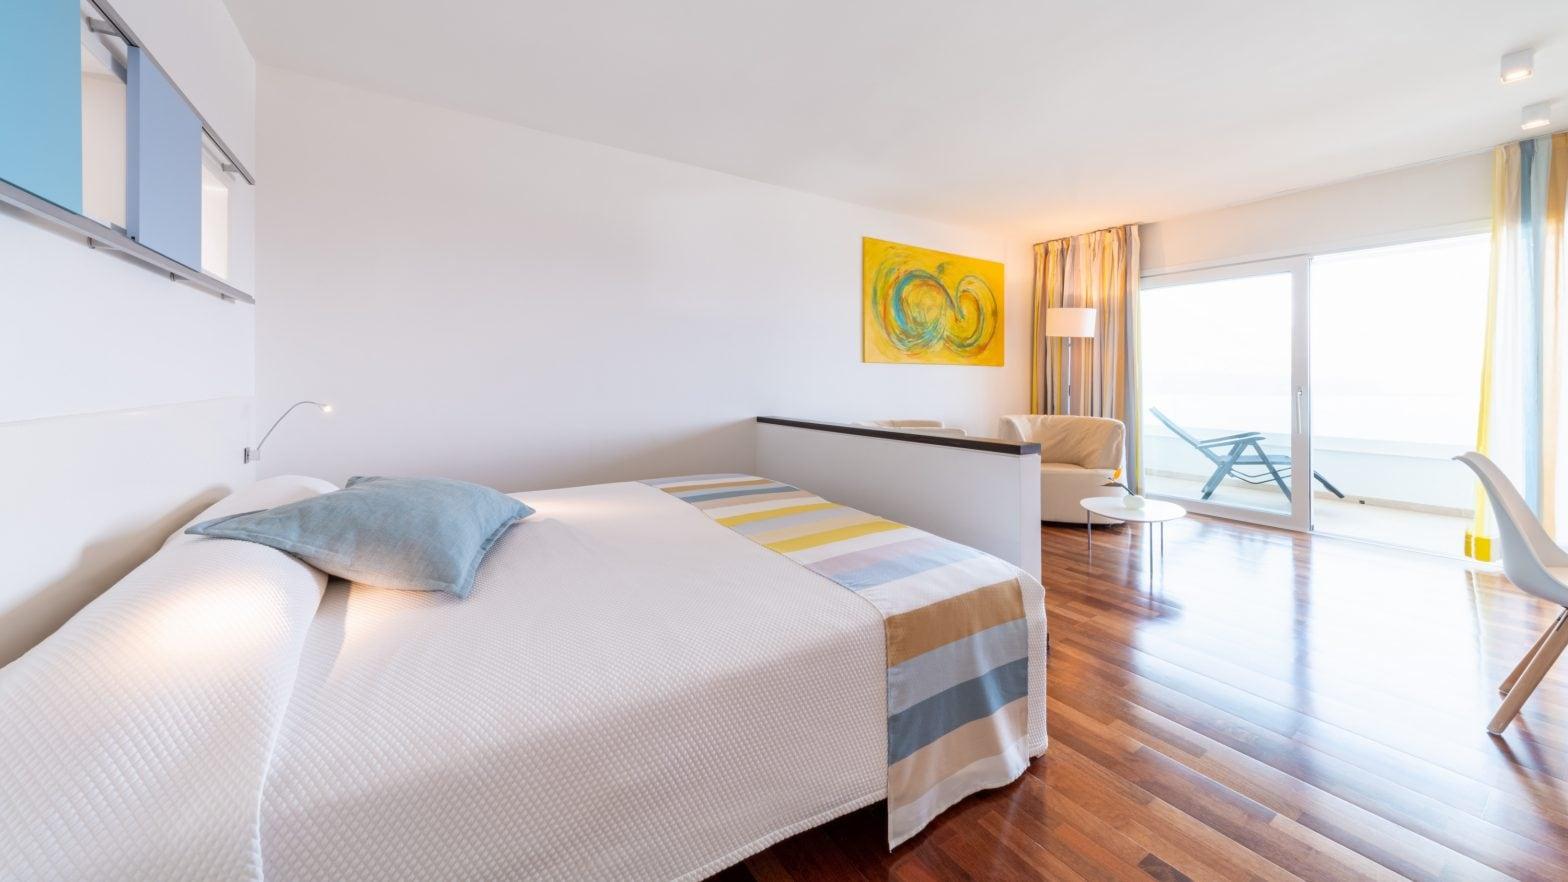 oceano-hotel-tenerife-design-doppelzimmer-2